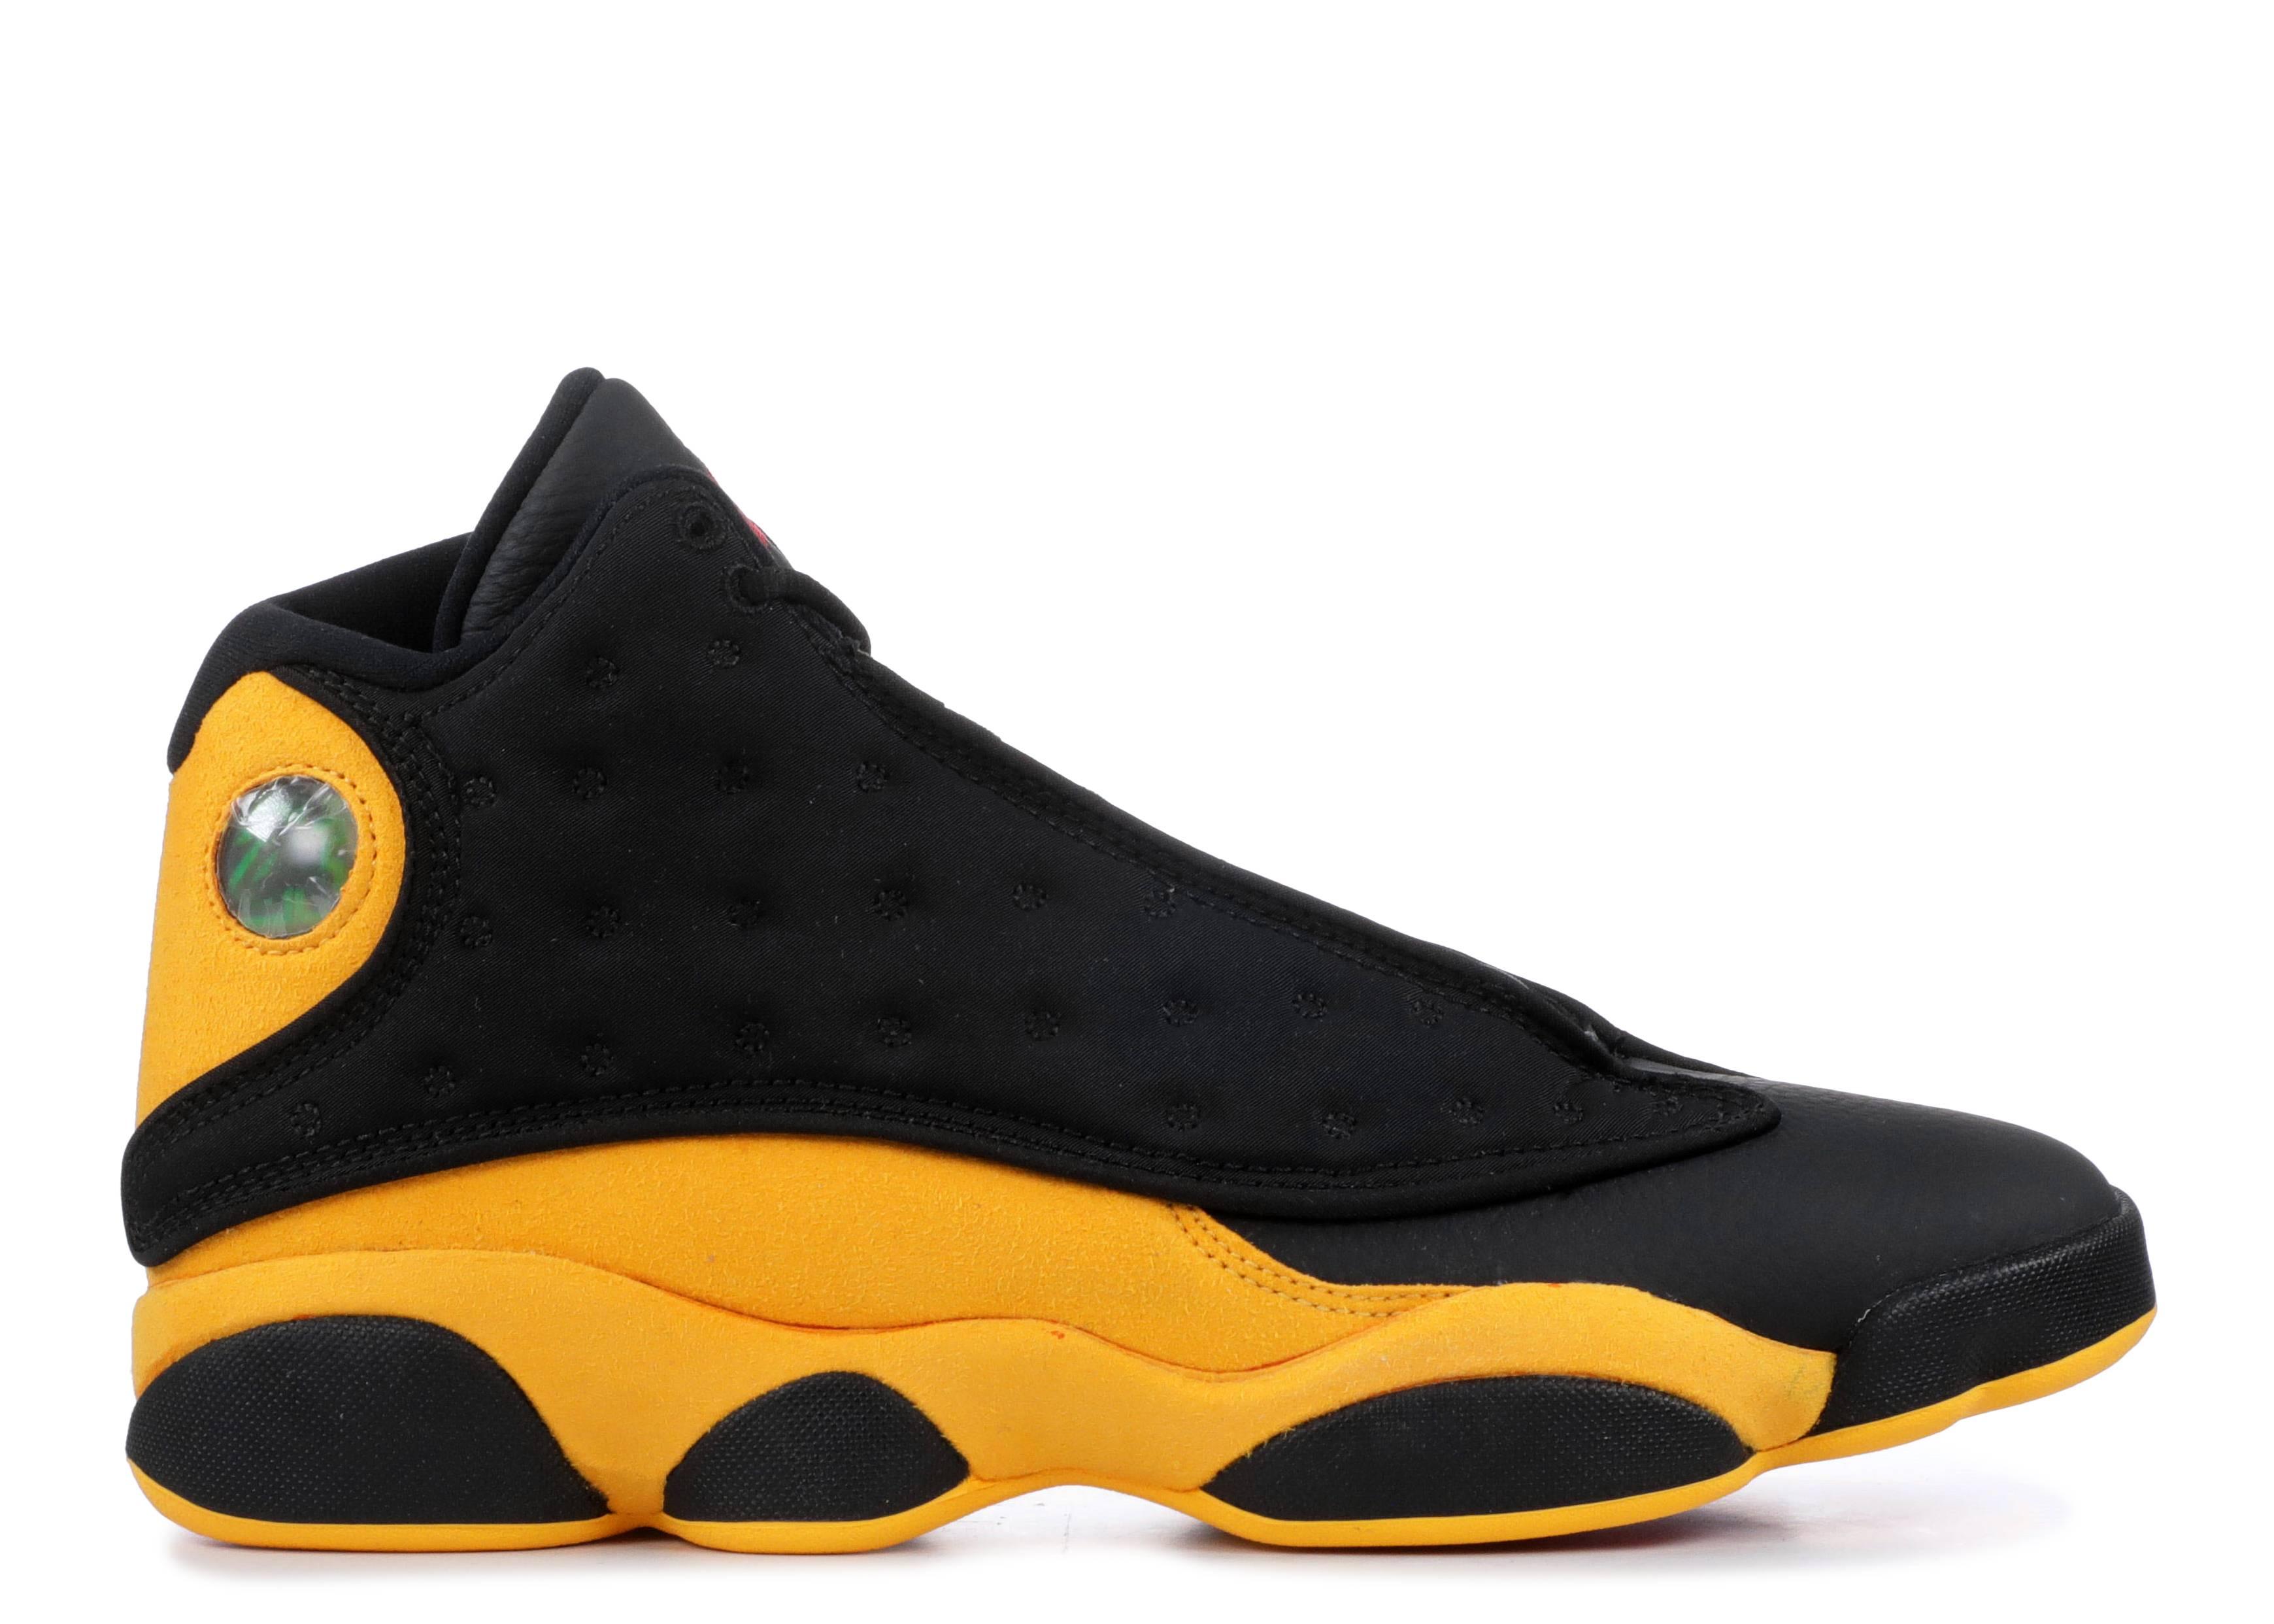 online store 3eeaa 0150b Air Jordan 13 Retro